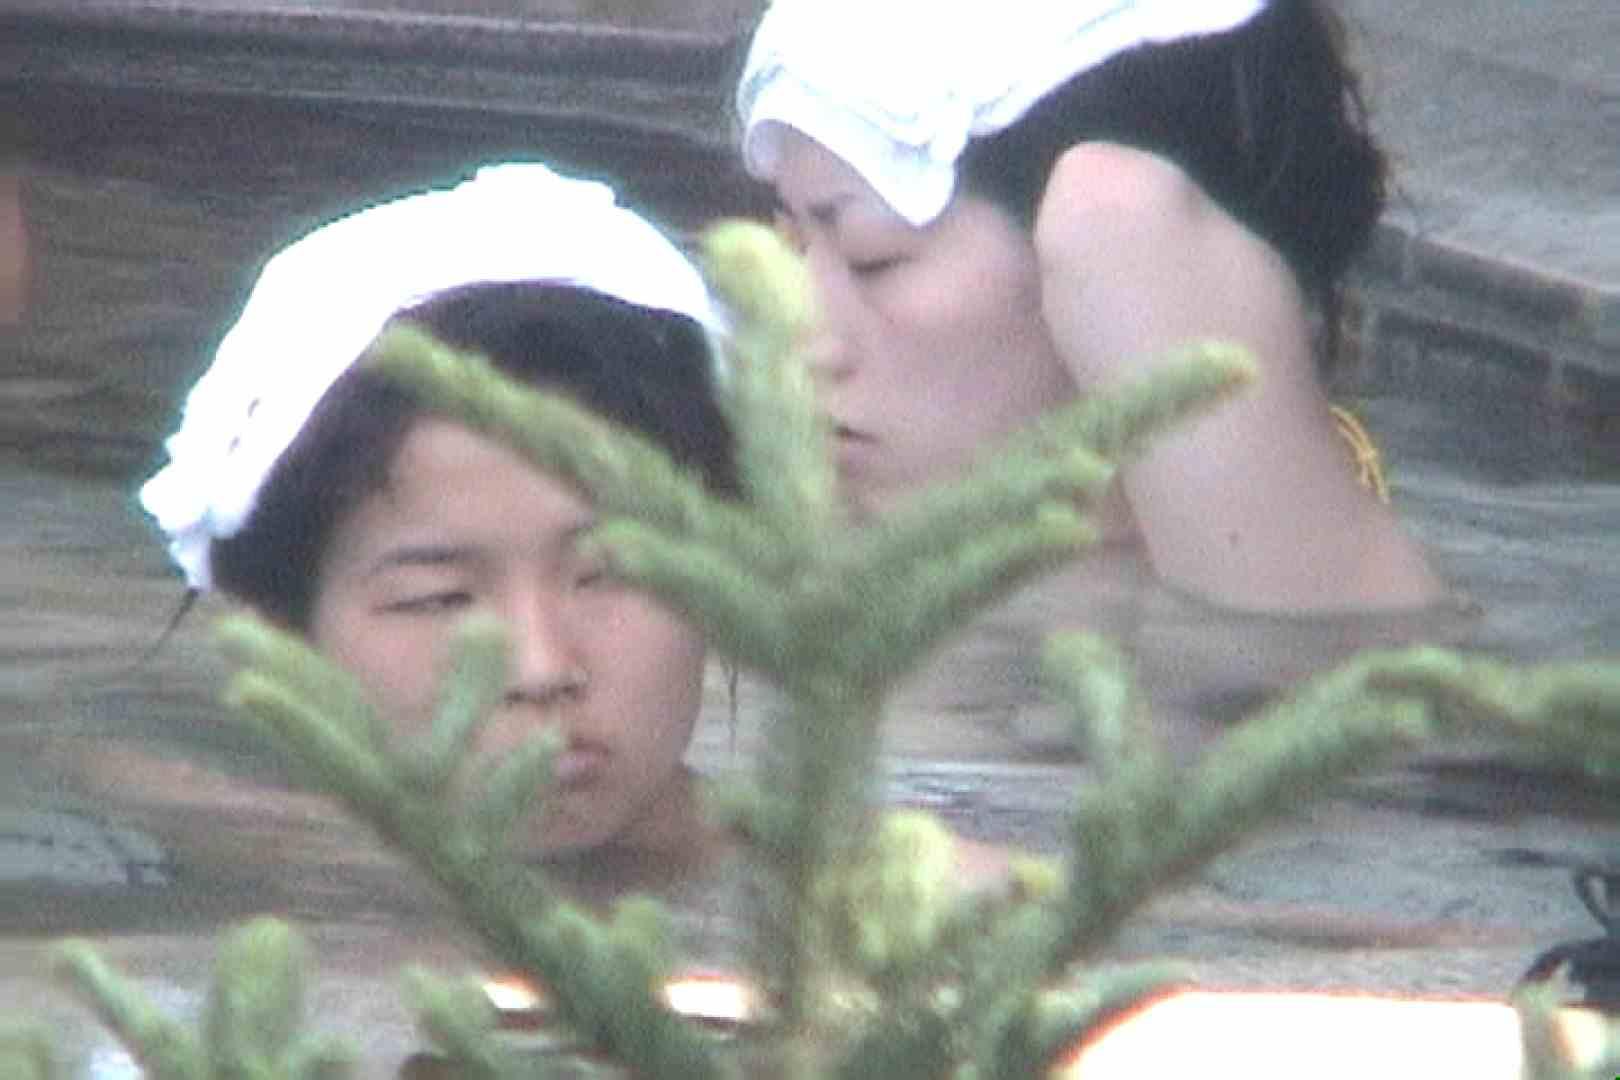 Aquaな露天風呂Vol.80【VIP限定】 盗撮 | HなOL  66pic 3